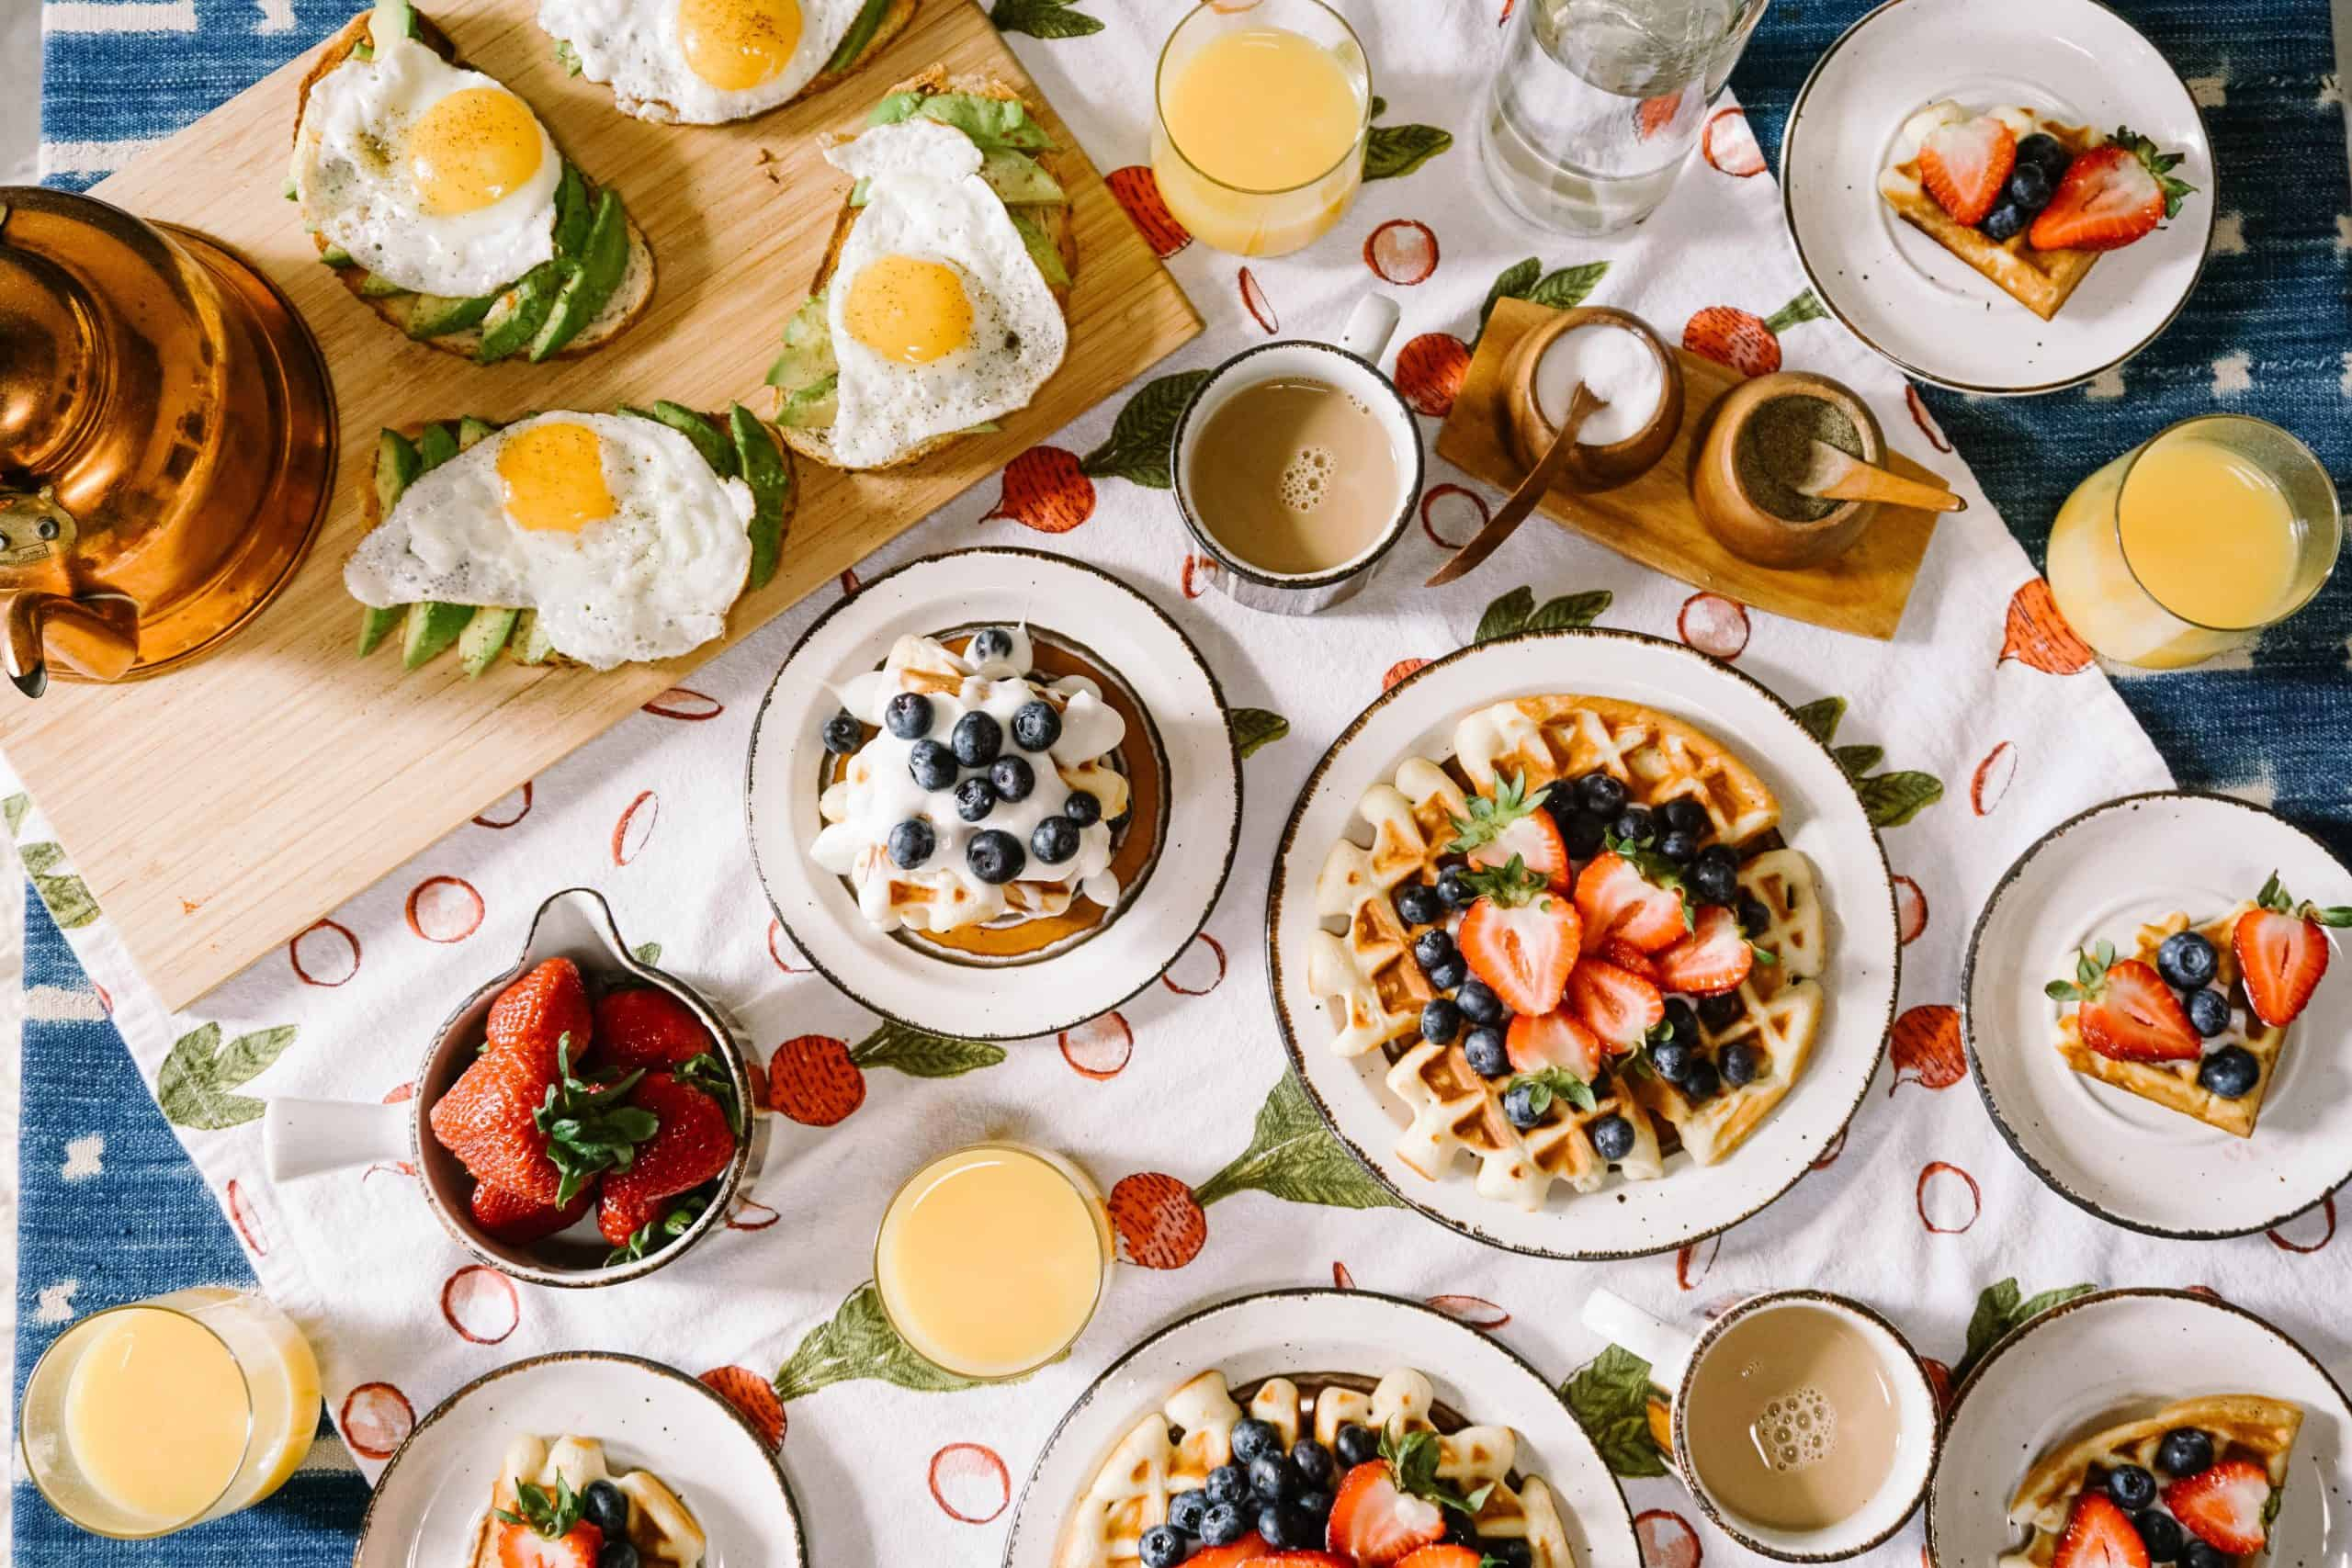 table with breakfast items spread across, like eggs, waffles, mimosas